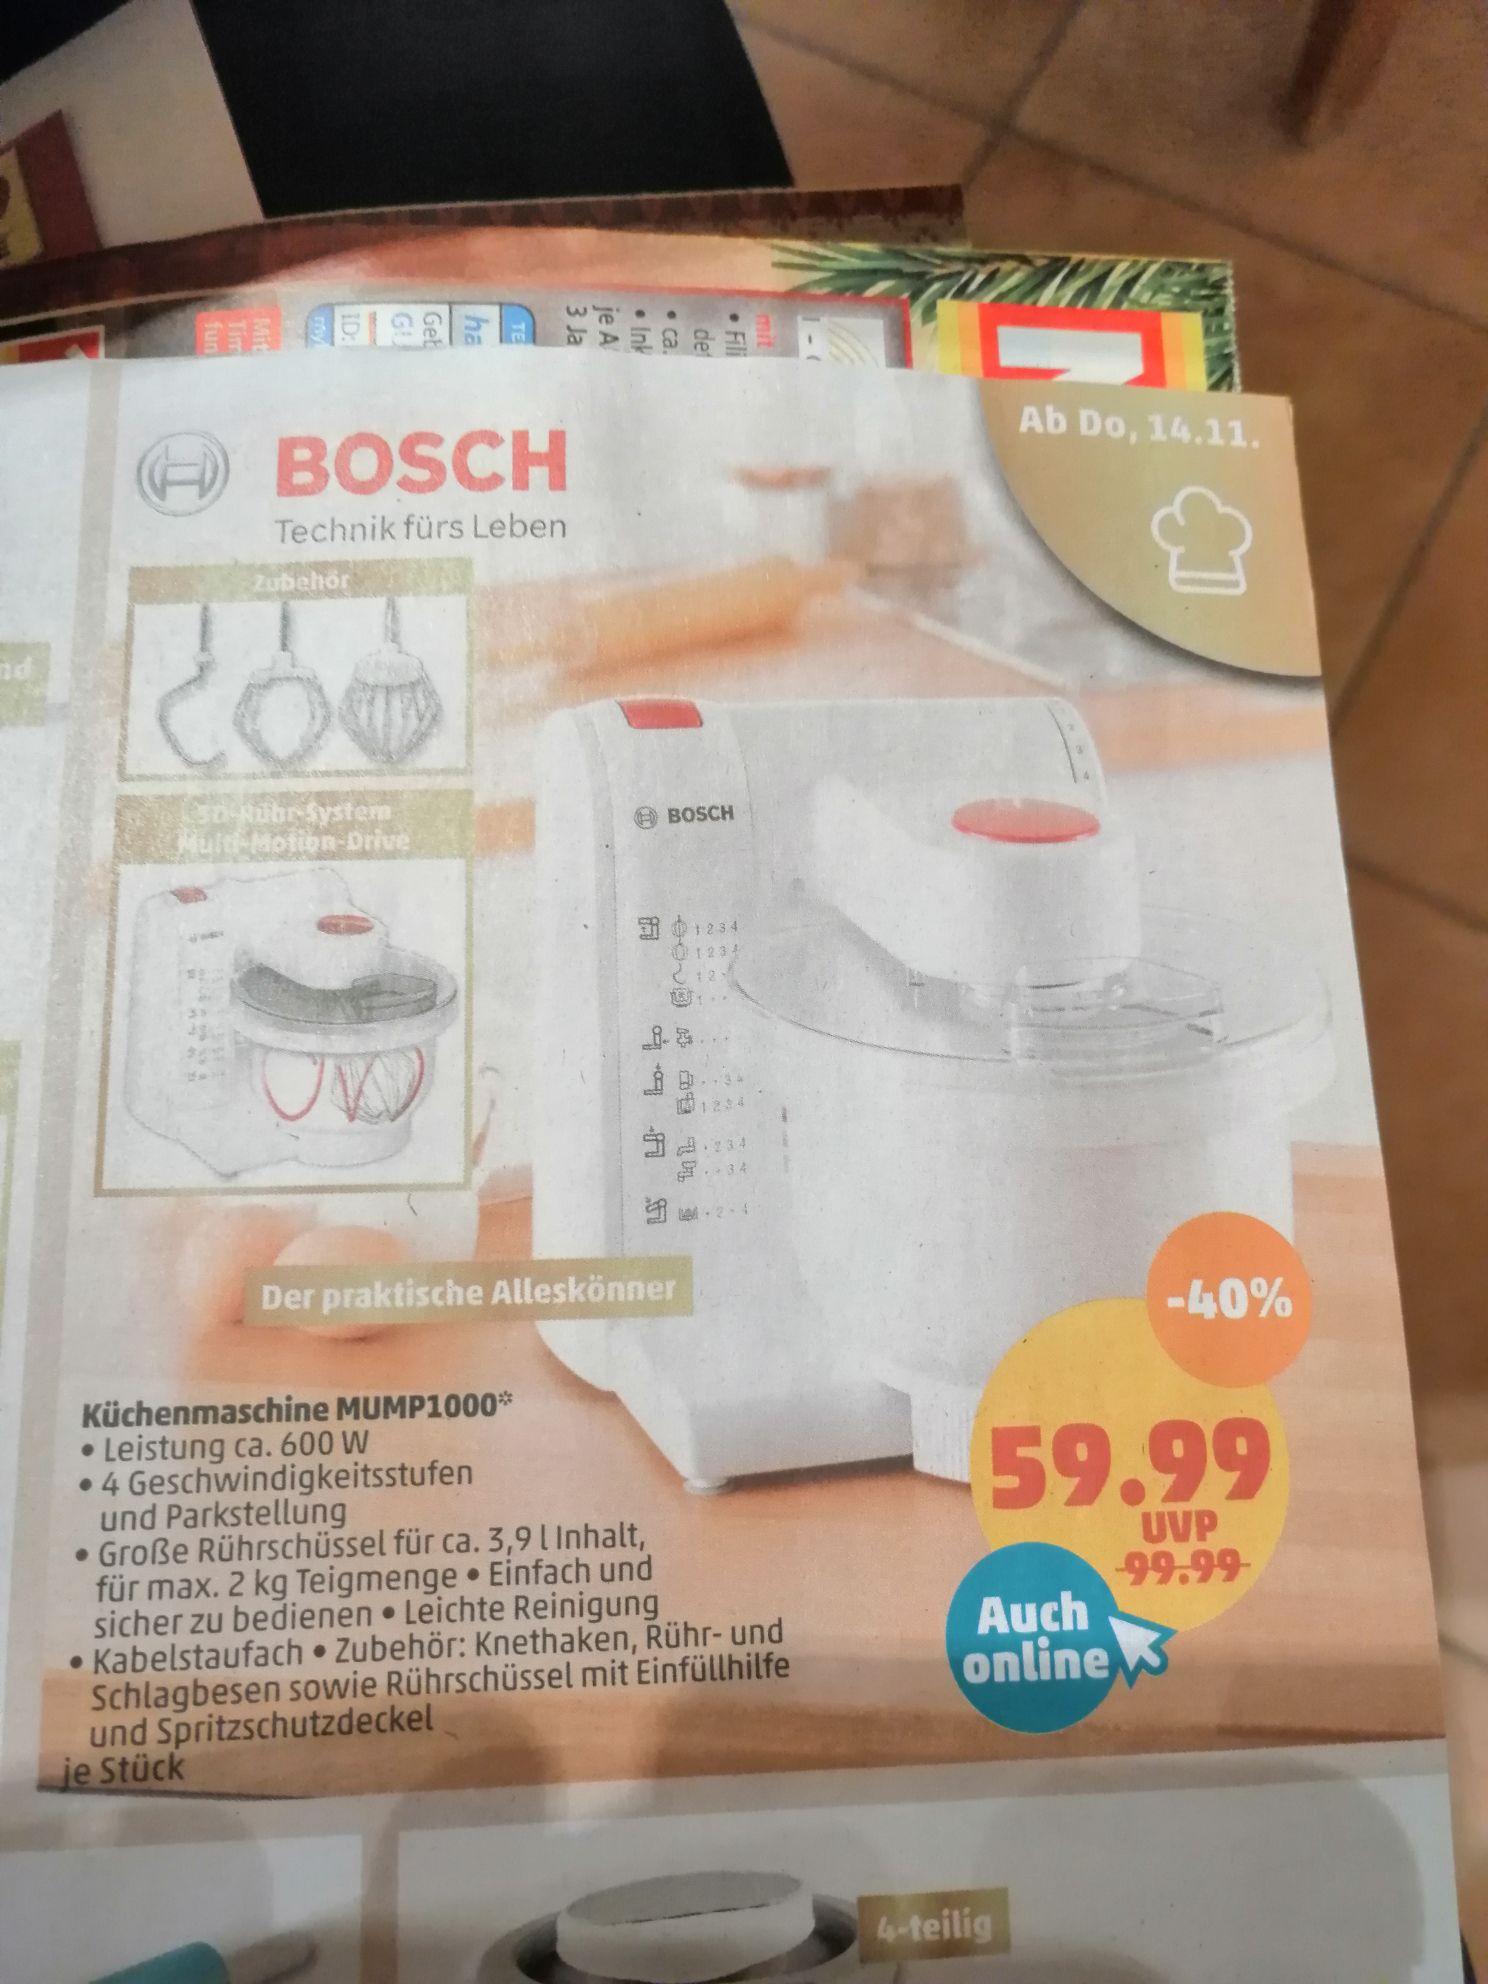 Bosch Küchenmaschine Mump1000 600watt bei Penny ab 14.11